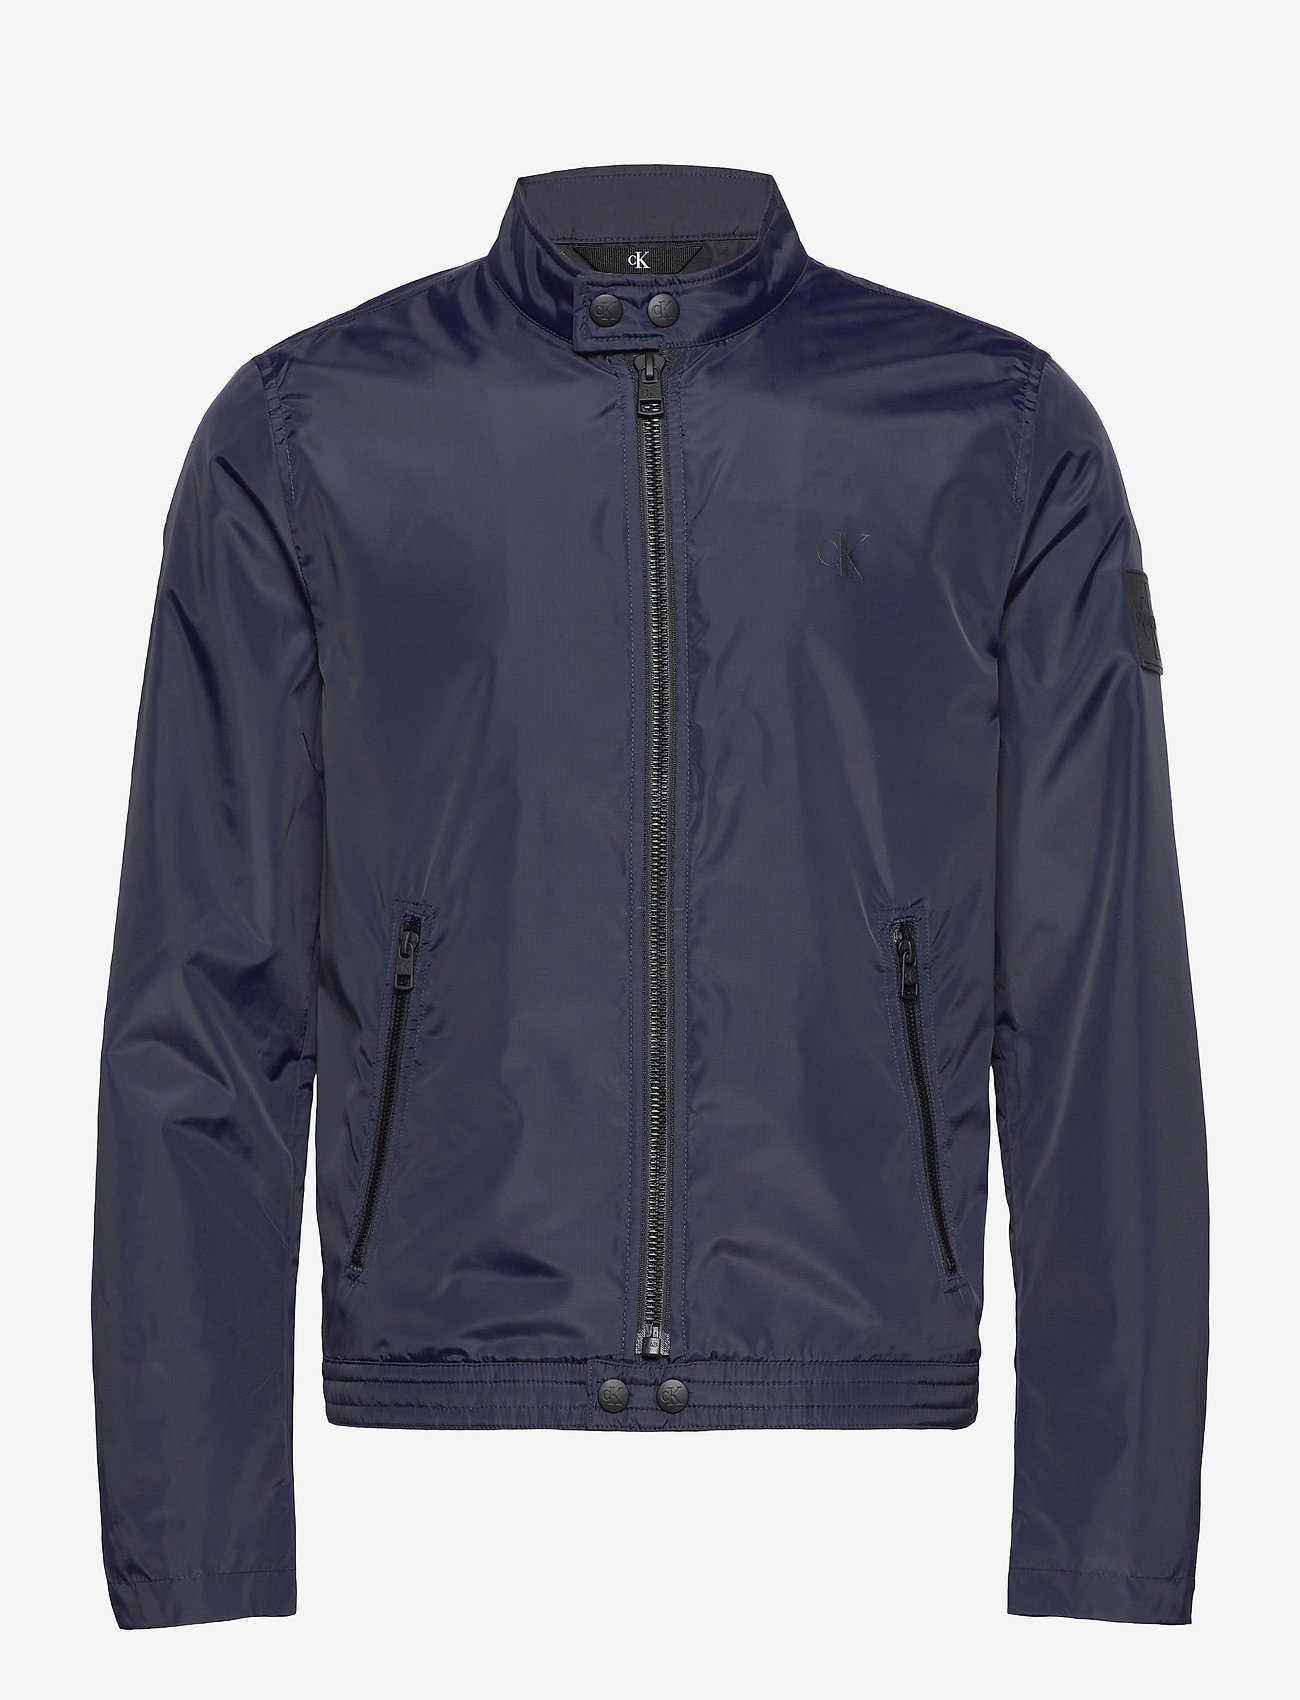 Calvin Klein Jeans - NYLON BIKER JACKET - vestes légères - night sky - 0